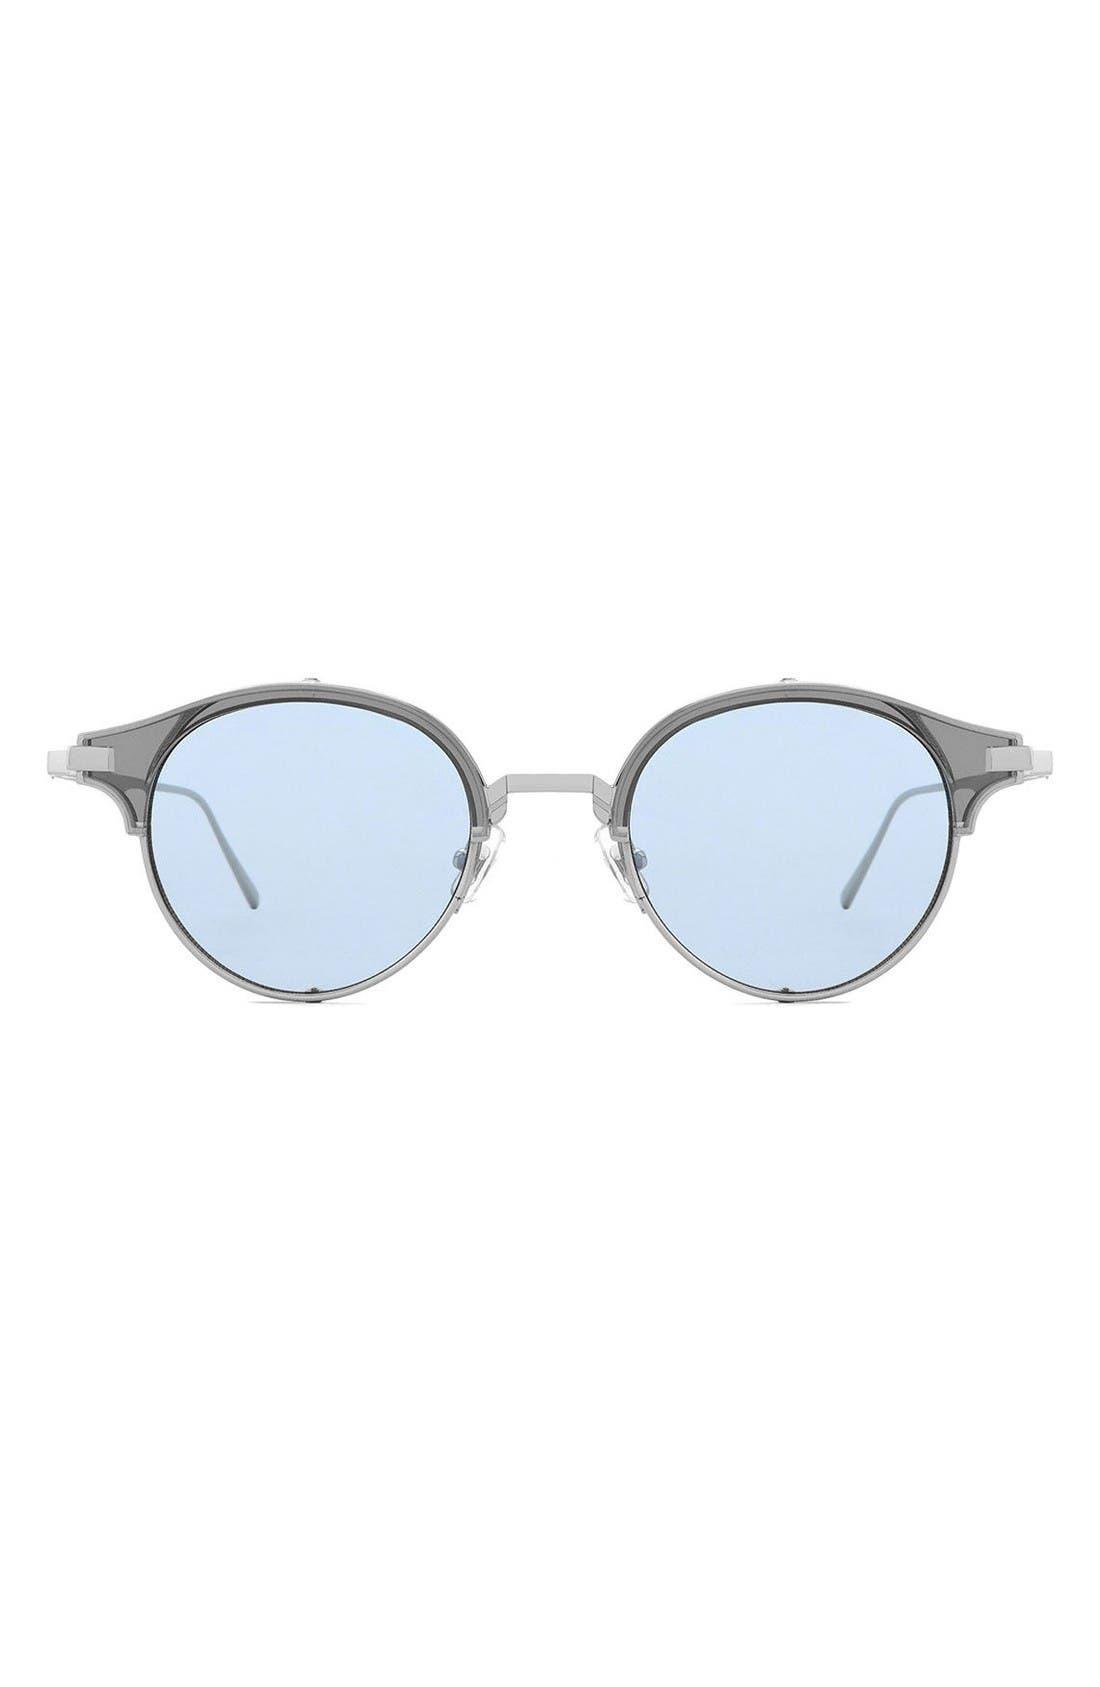 GENTLE MONSTER Double Erok 50mm Cat Eye Sunglasses